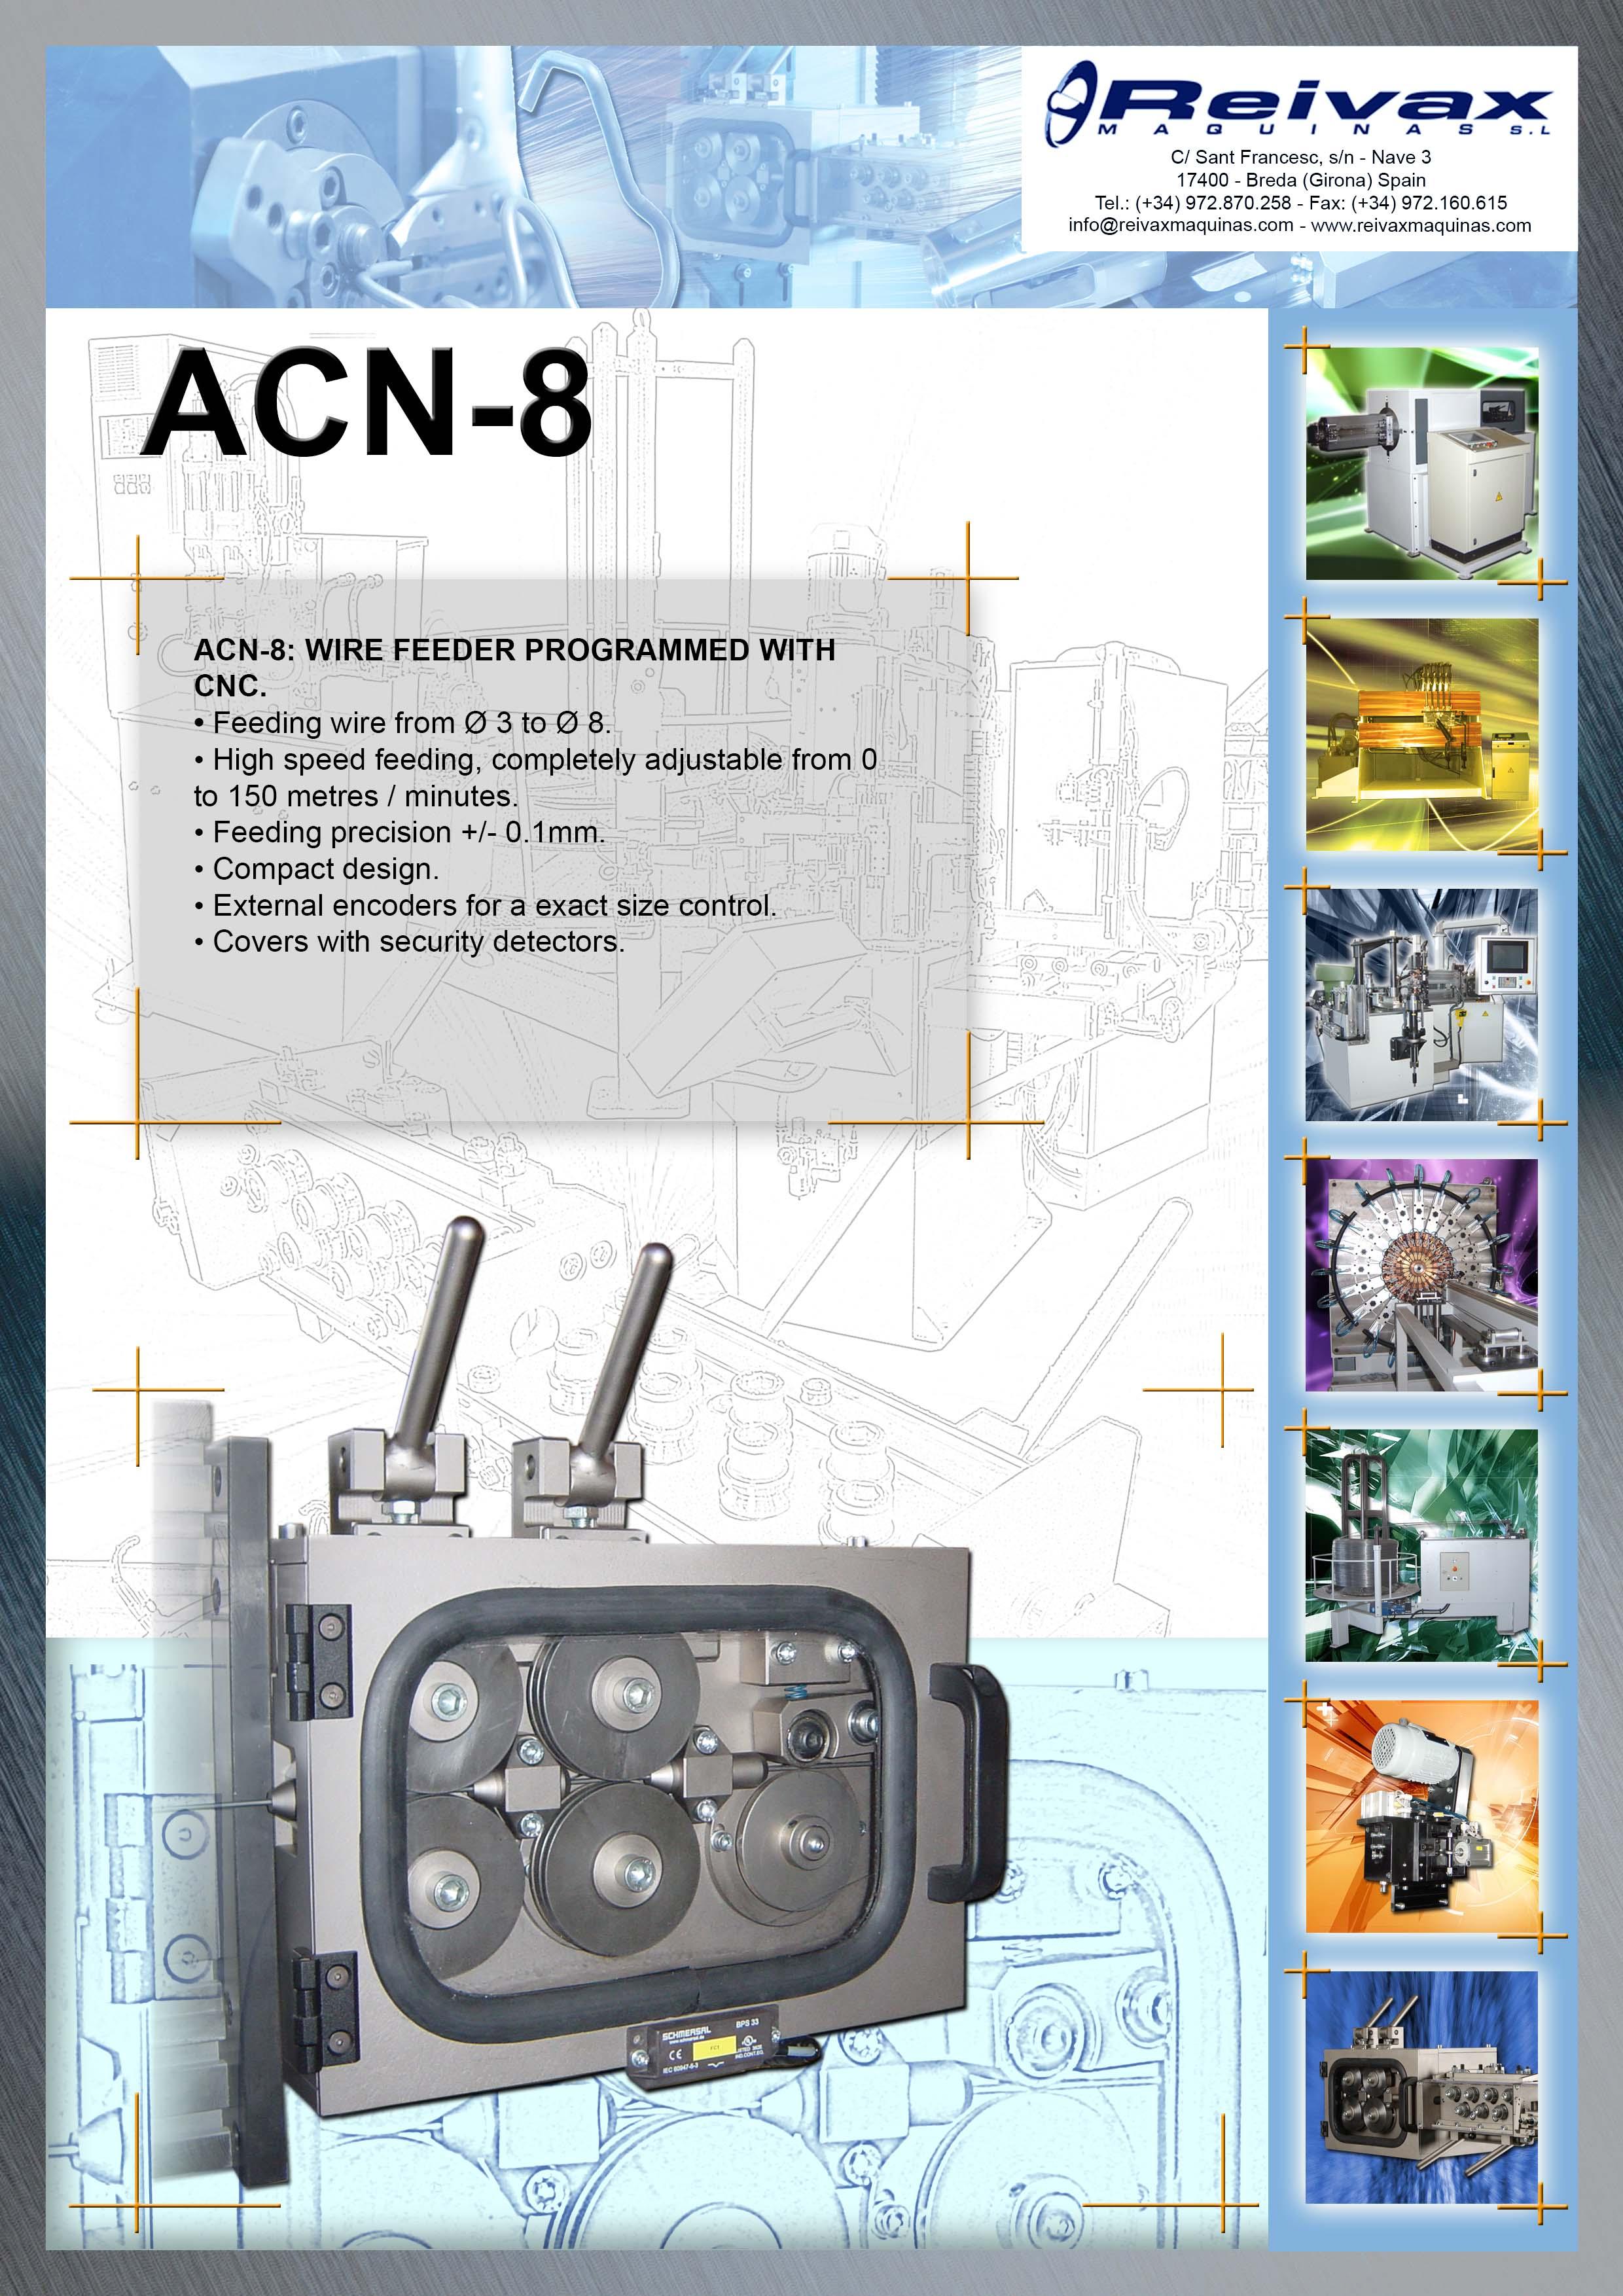 ReivaxMaquinas: Technical Details ACN-8